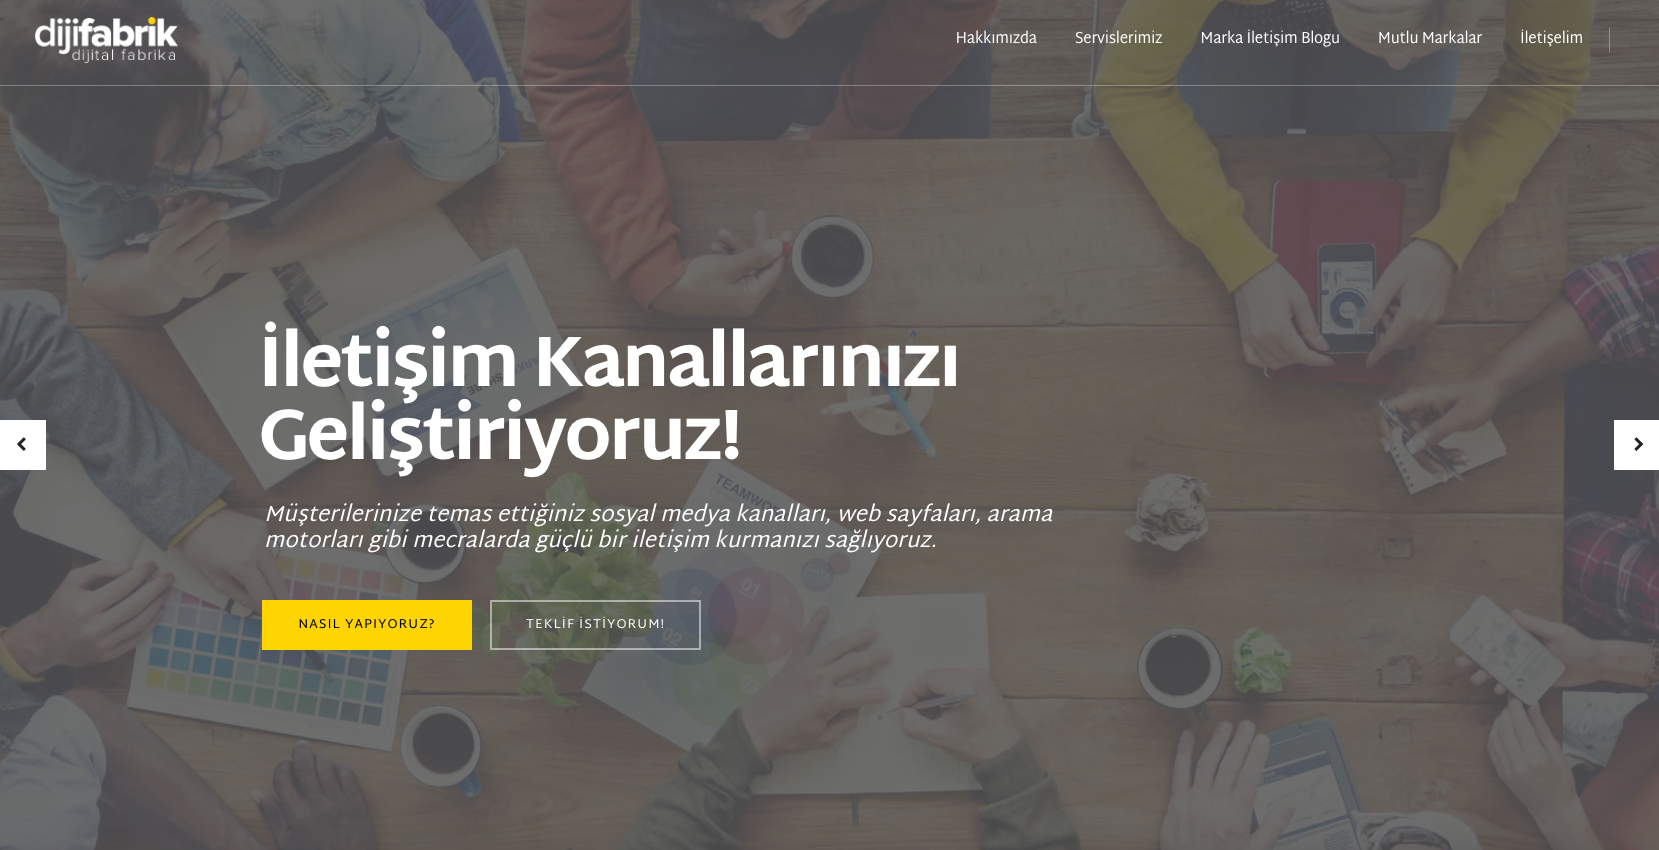 Dijifabrik - Turkey - Agency - Digital